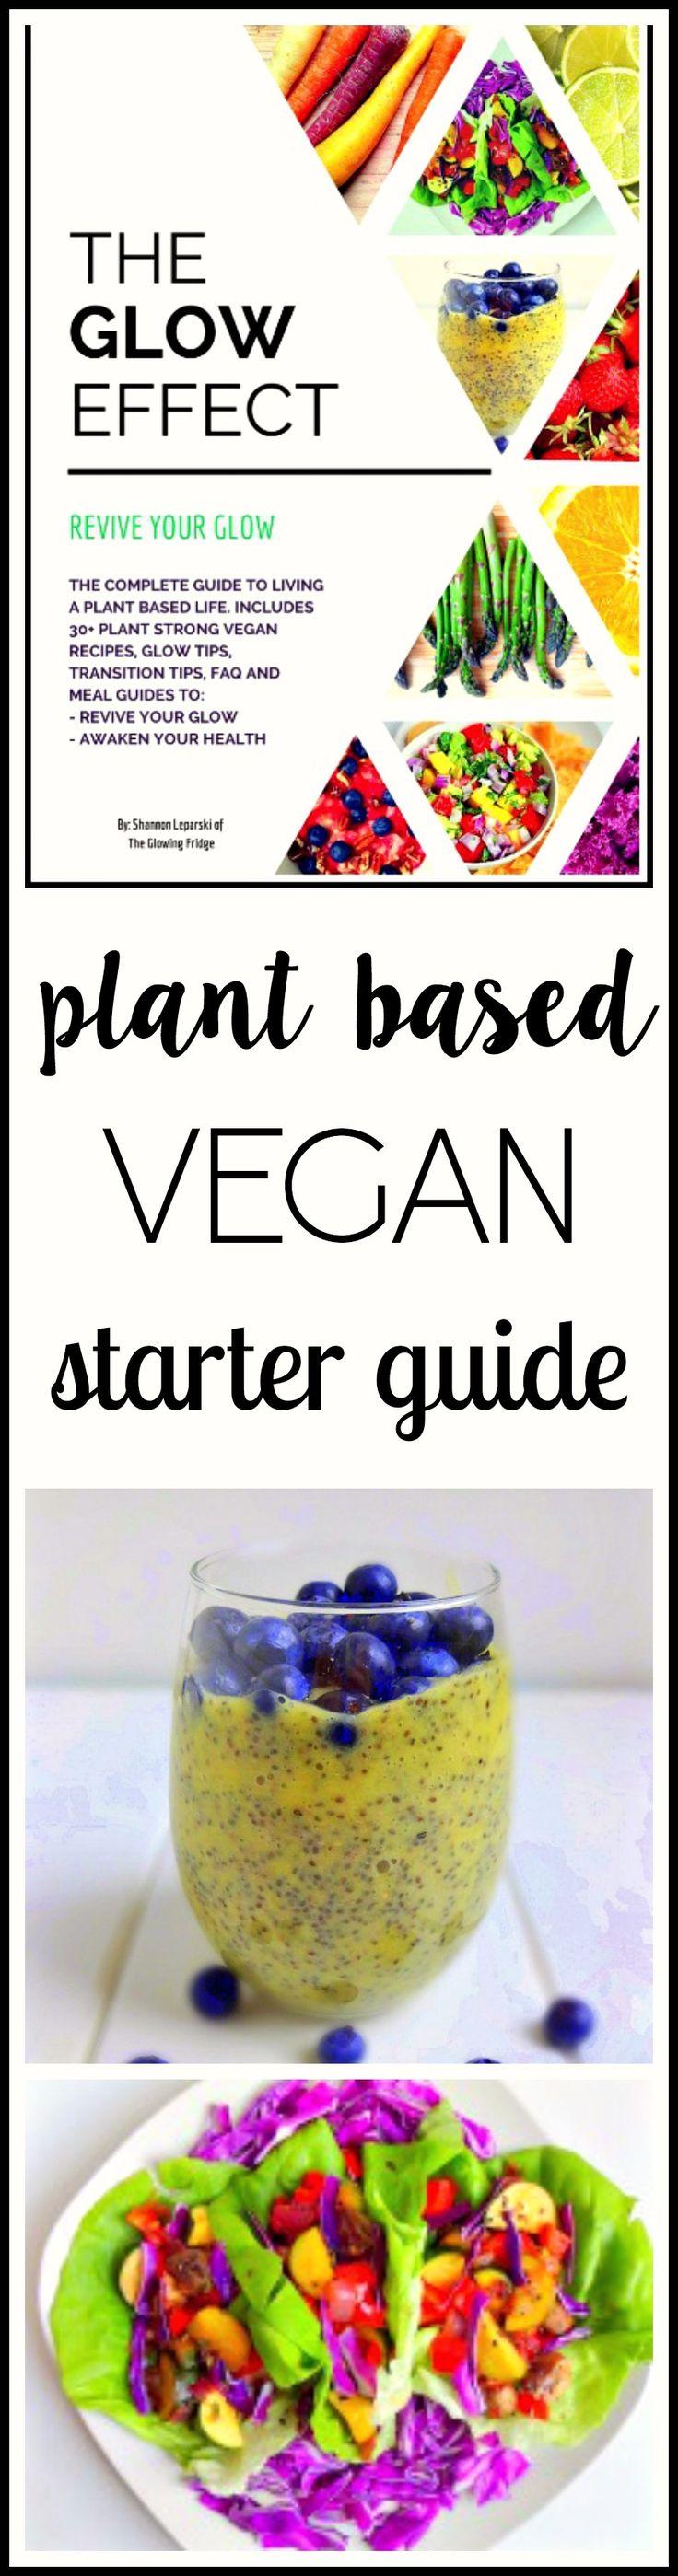 Vegan Starter Guide Happy, Detox program and For glowing